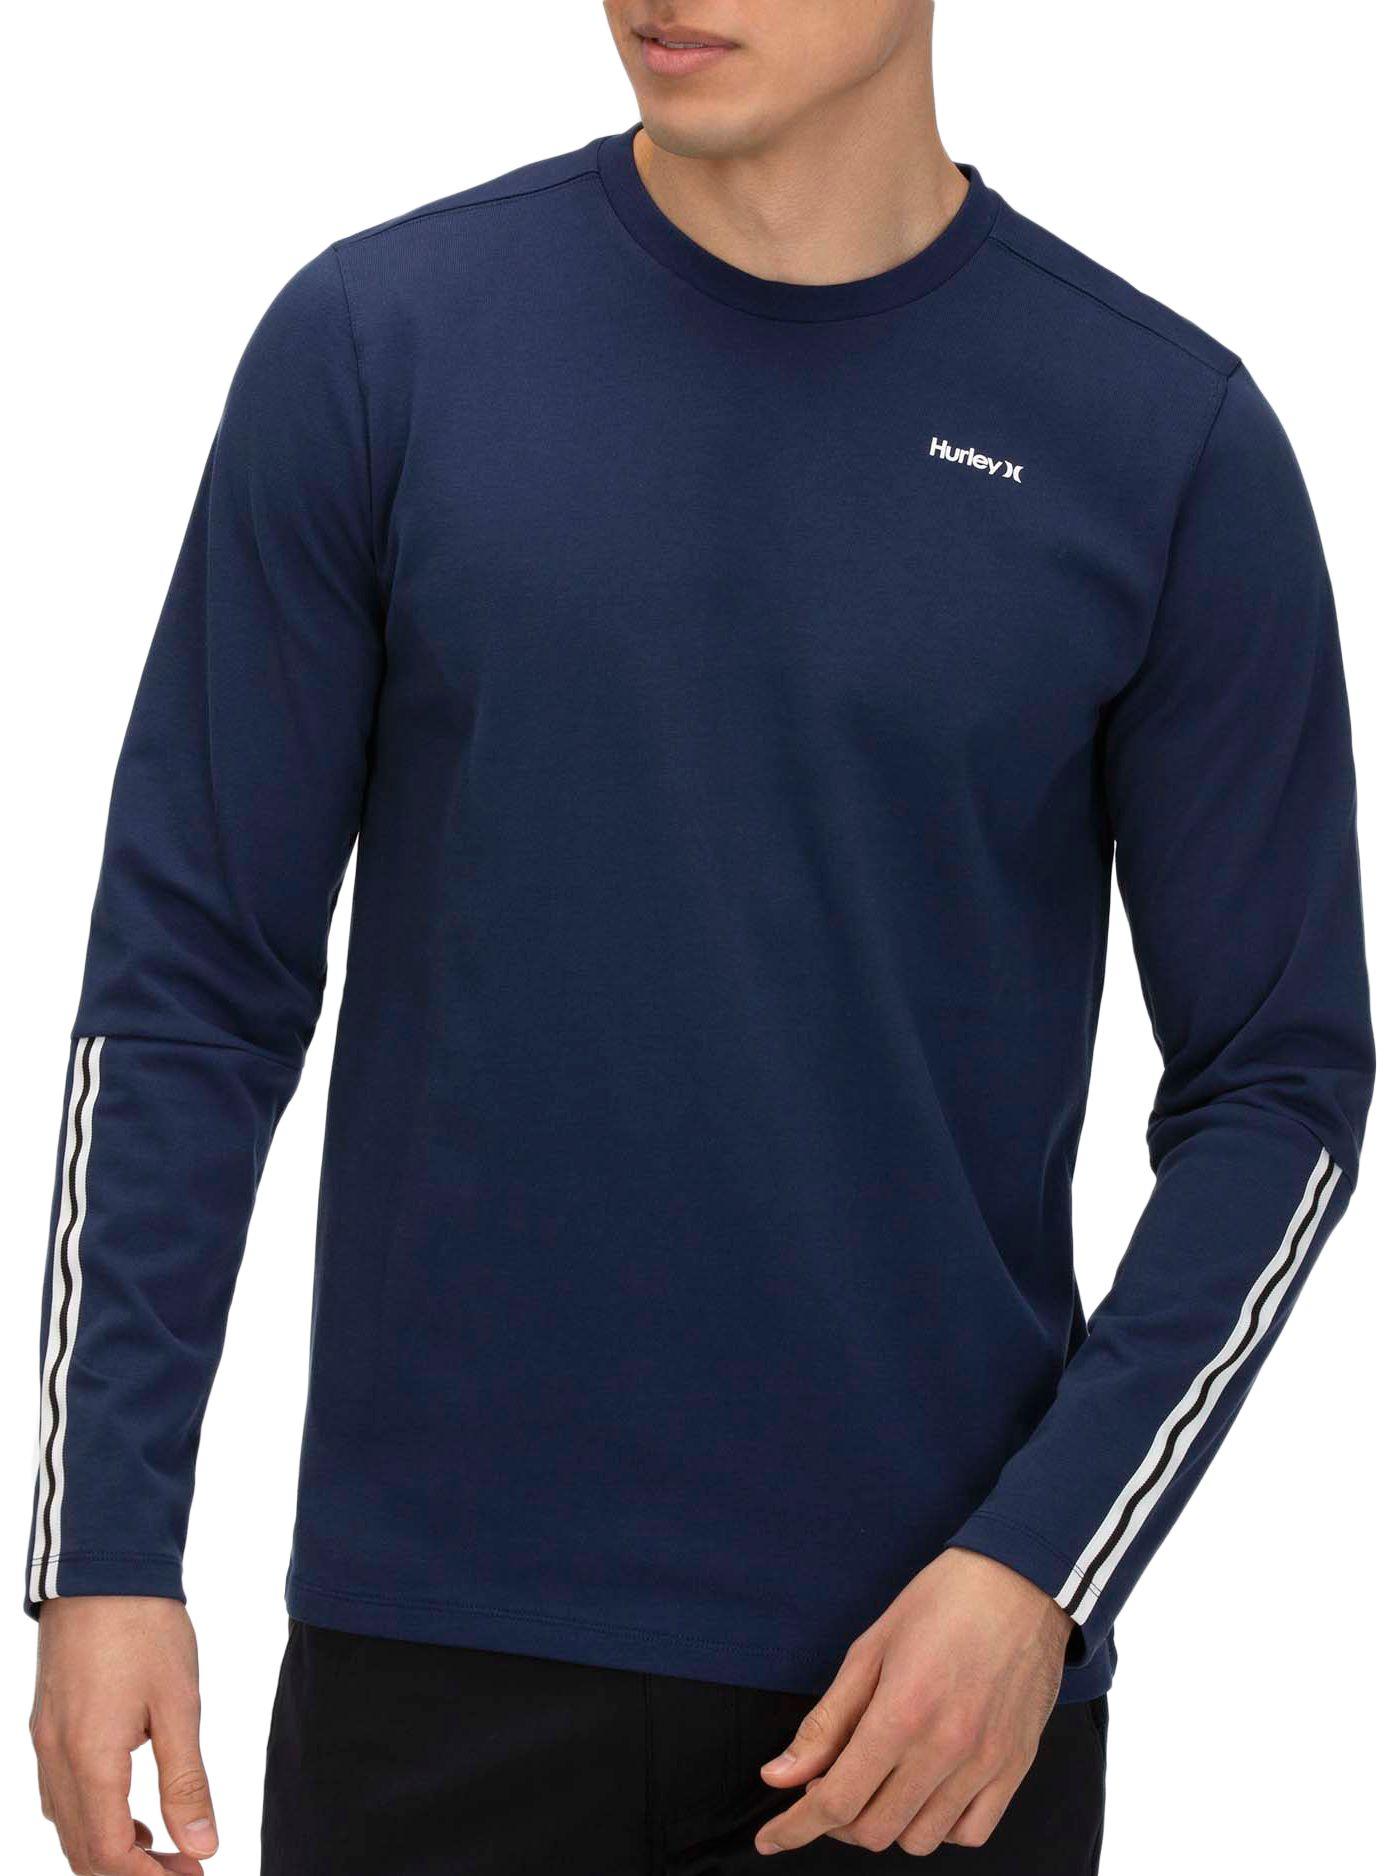 Hurley Men's Morro Bay Long Sleeve T-Shirt